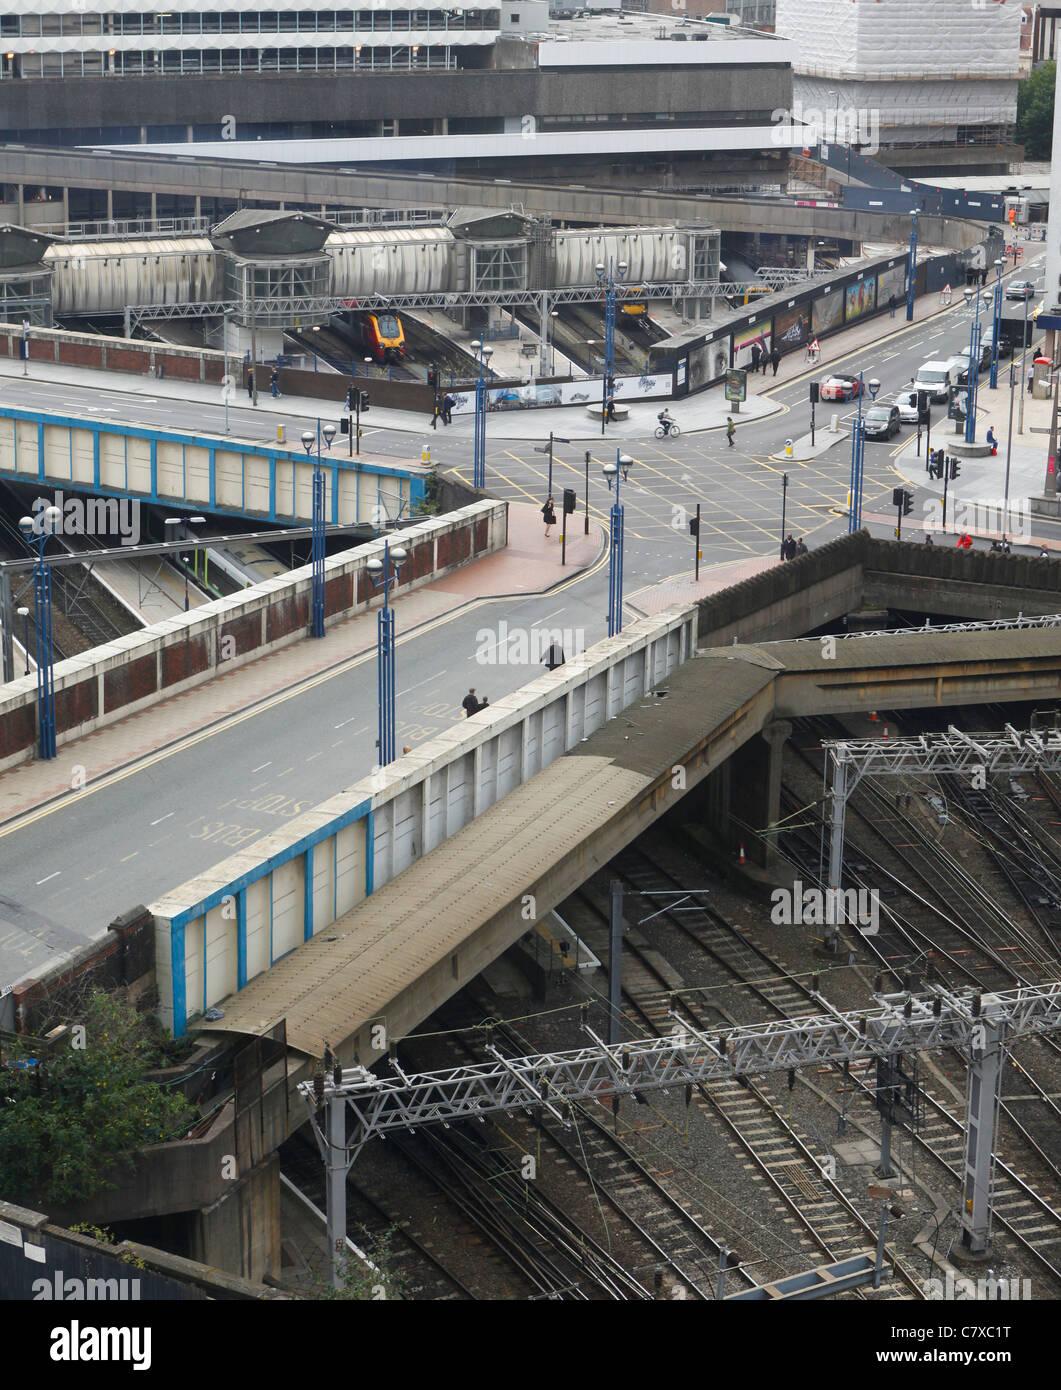 New Street Railway Station, Birmingham City Centre, England - Stock Image